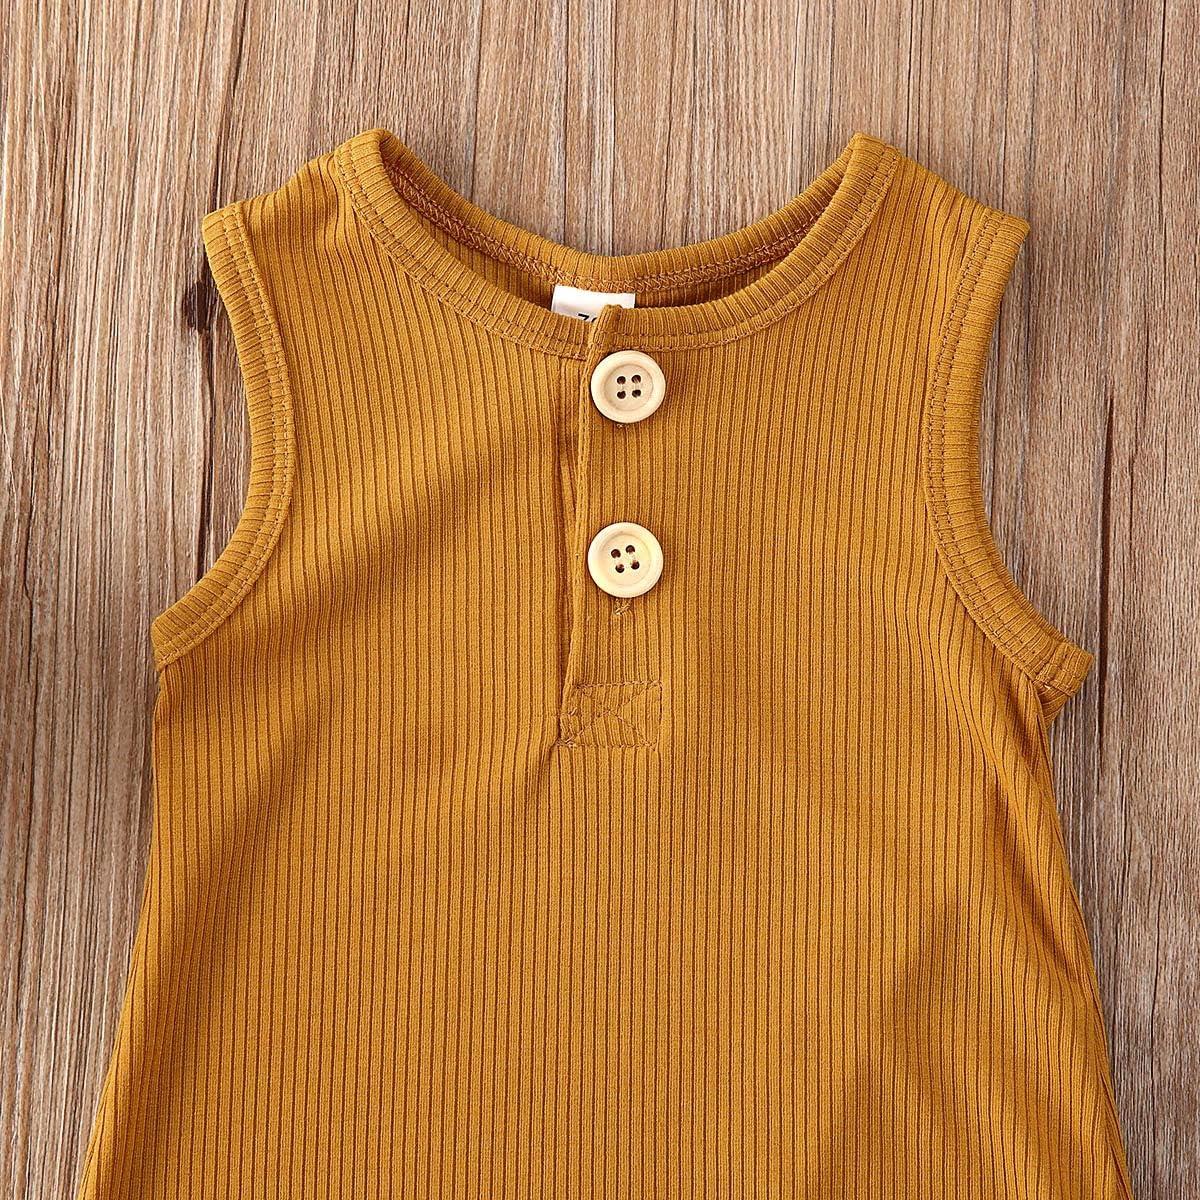 iddolaka Newborn Summer Baby Boy Girl Romper Bodysuit Jumpsuit Playsuit One Piece Outfit Clothes